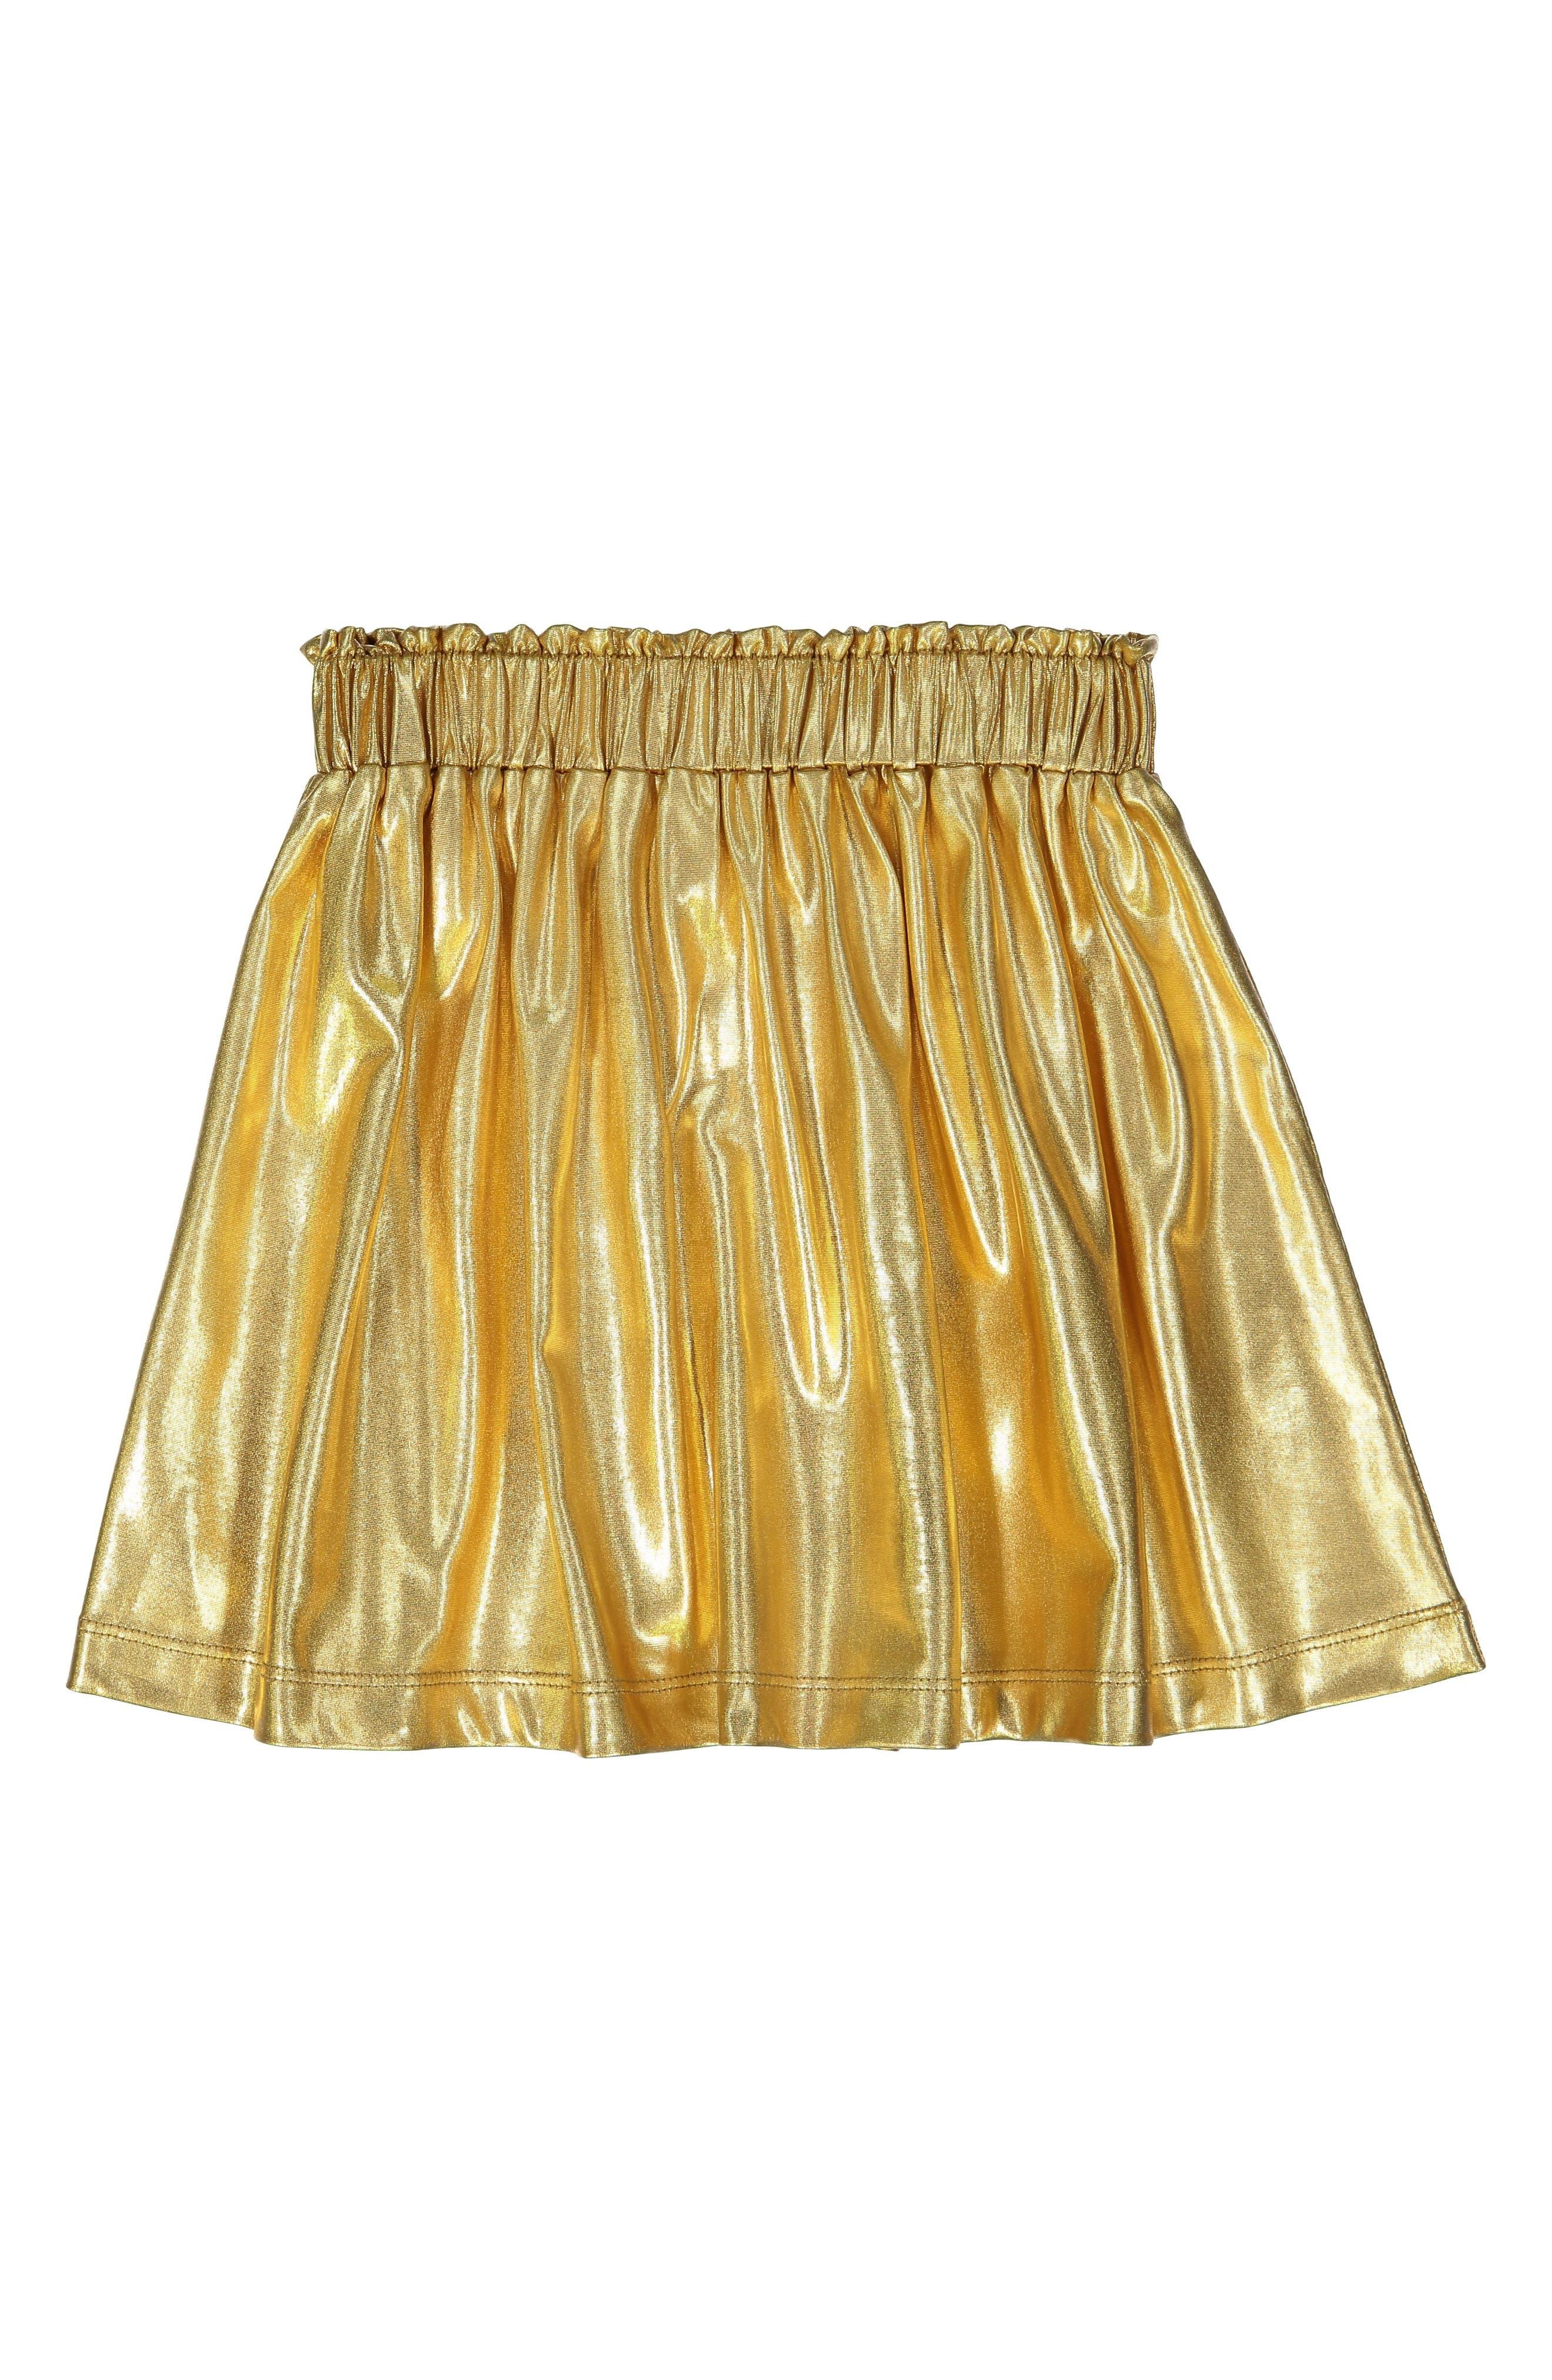 MASALA BABY Gold Metallic Skirt, Main, color, GOLD